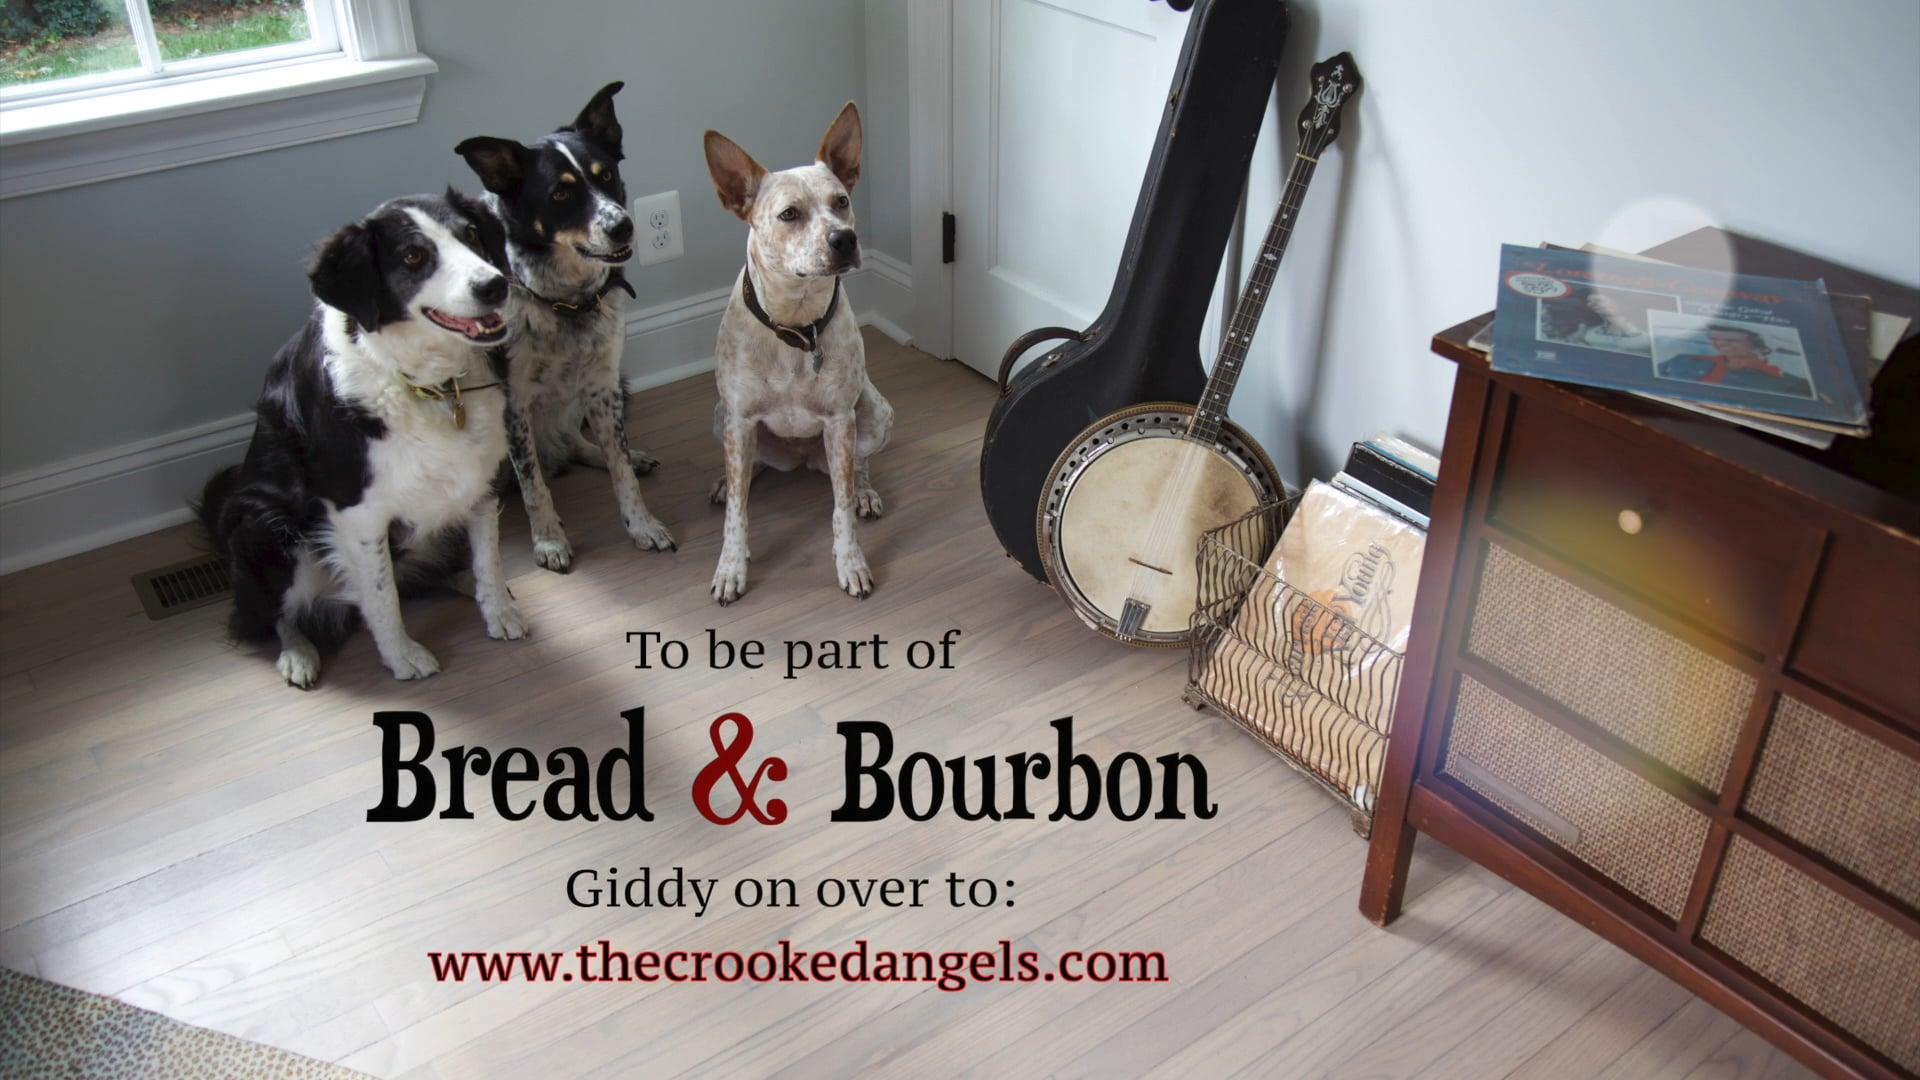 Let's Make Bread & Bourbon!